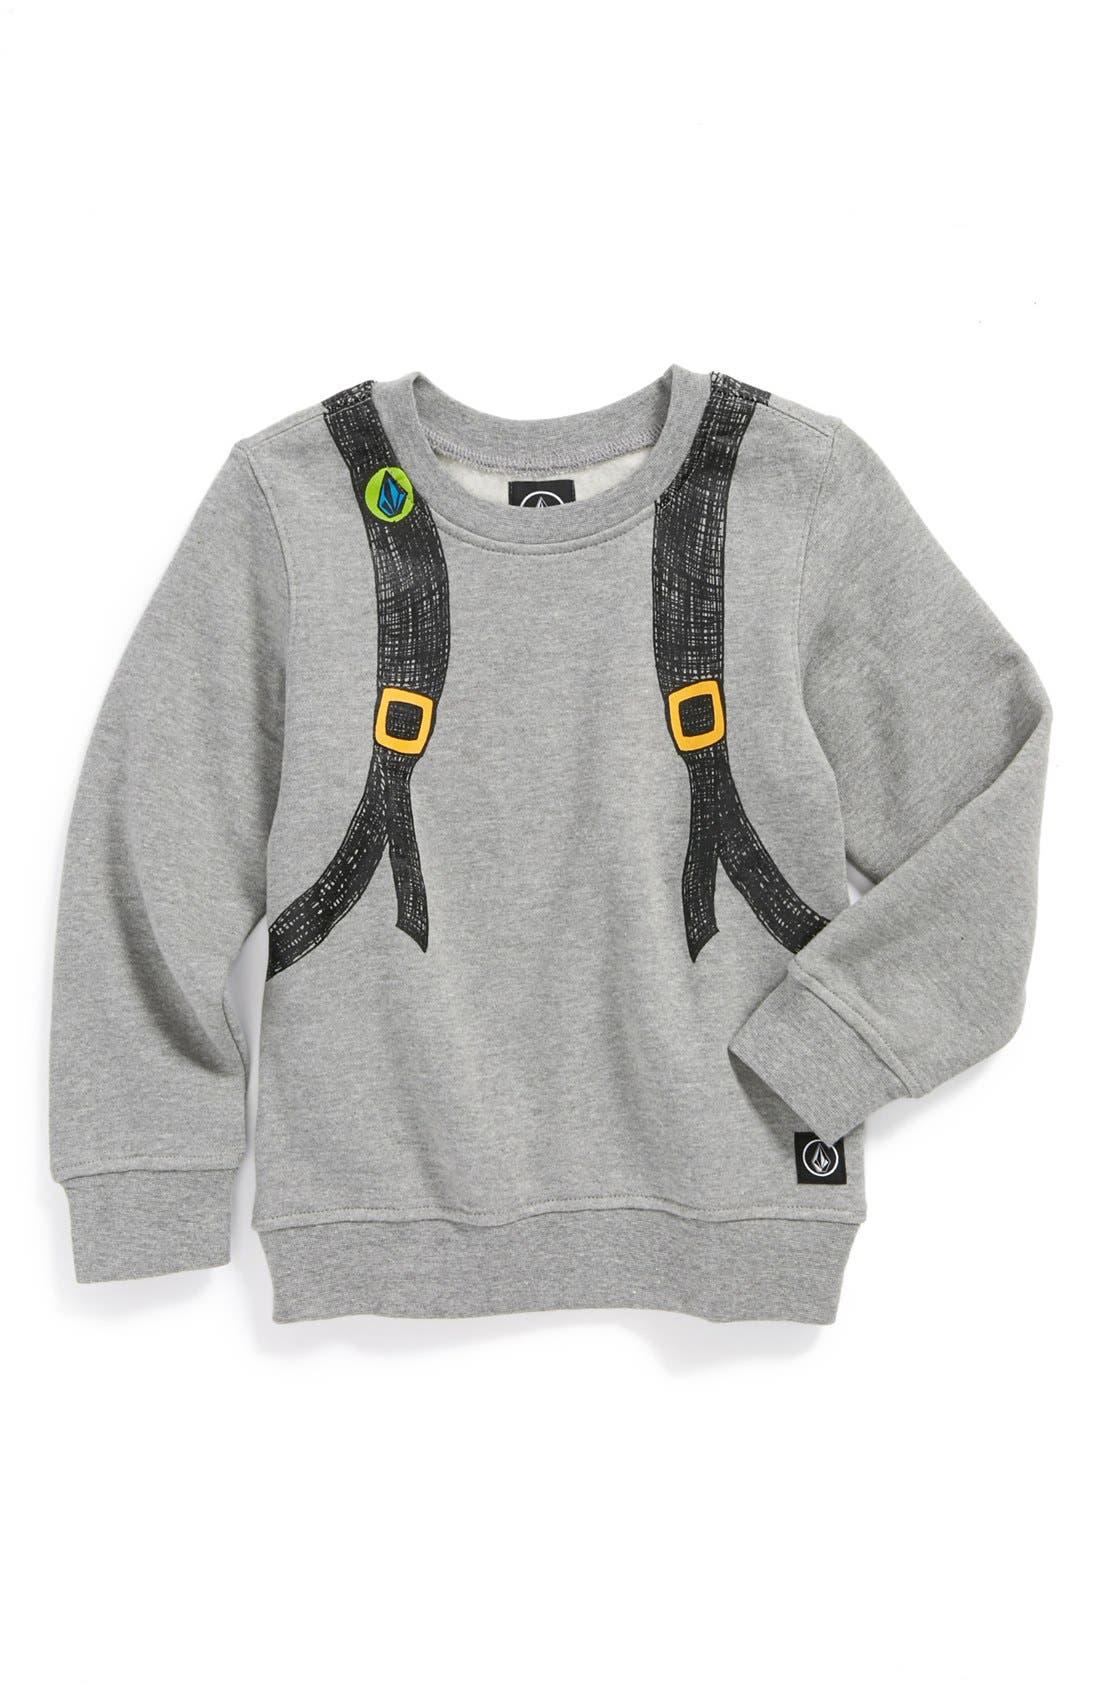 Main Image - Volcom 'Reconeryo' Sweatshirt (Little Boys)